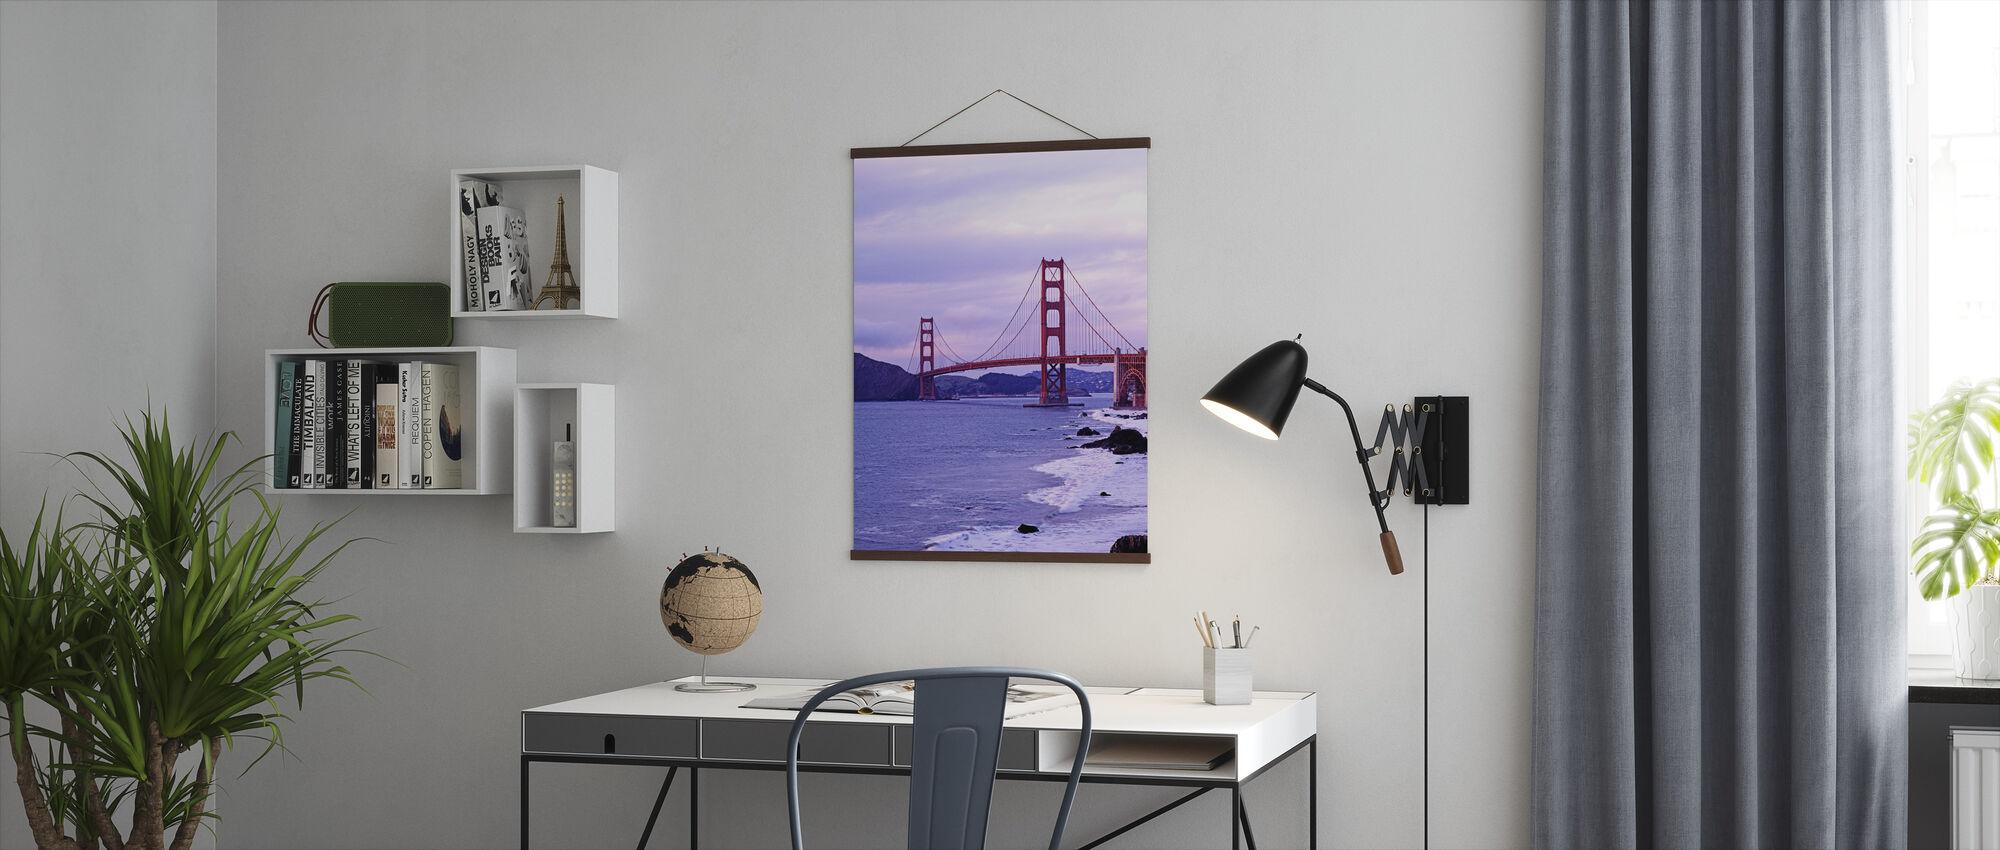 Bay Bridge in Purple Haze - Poster - Office